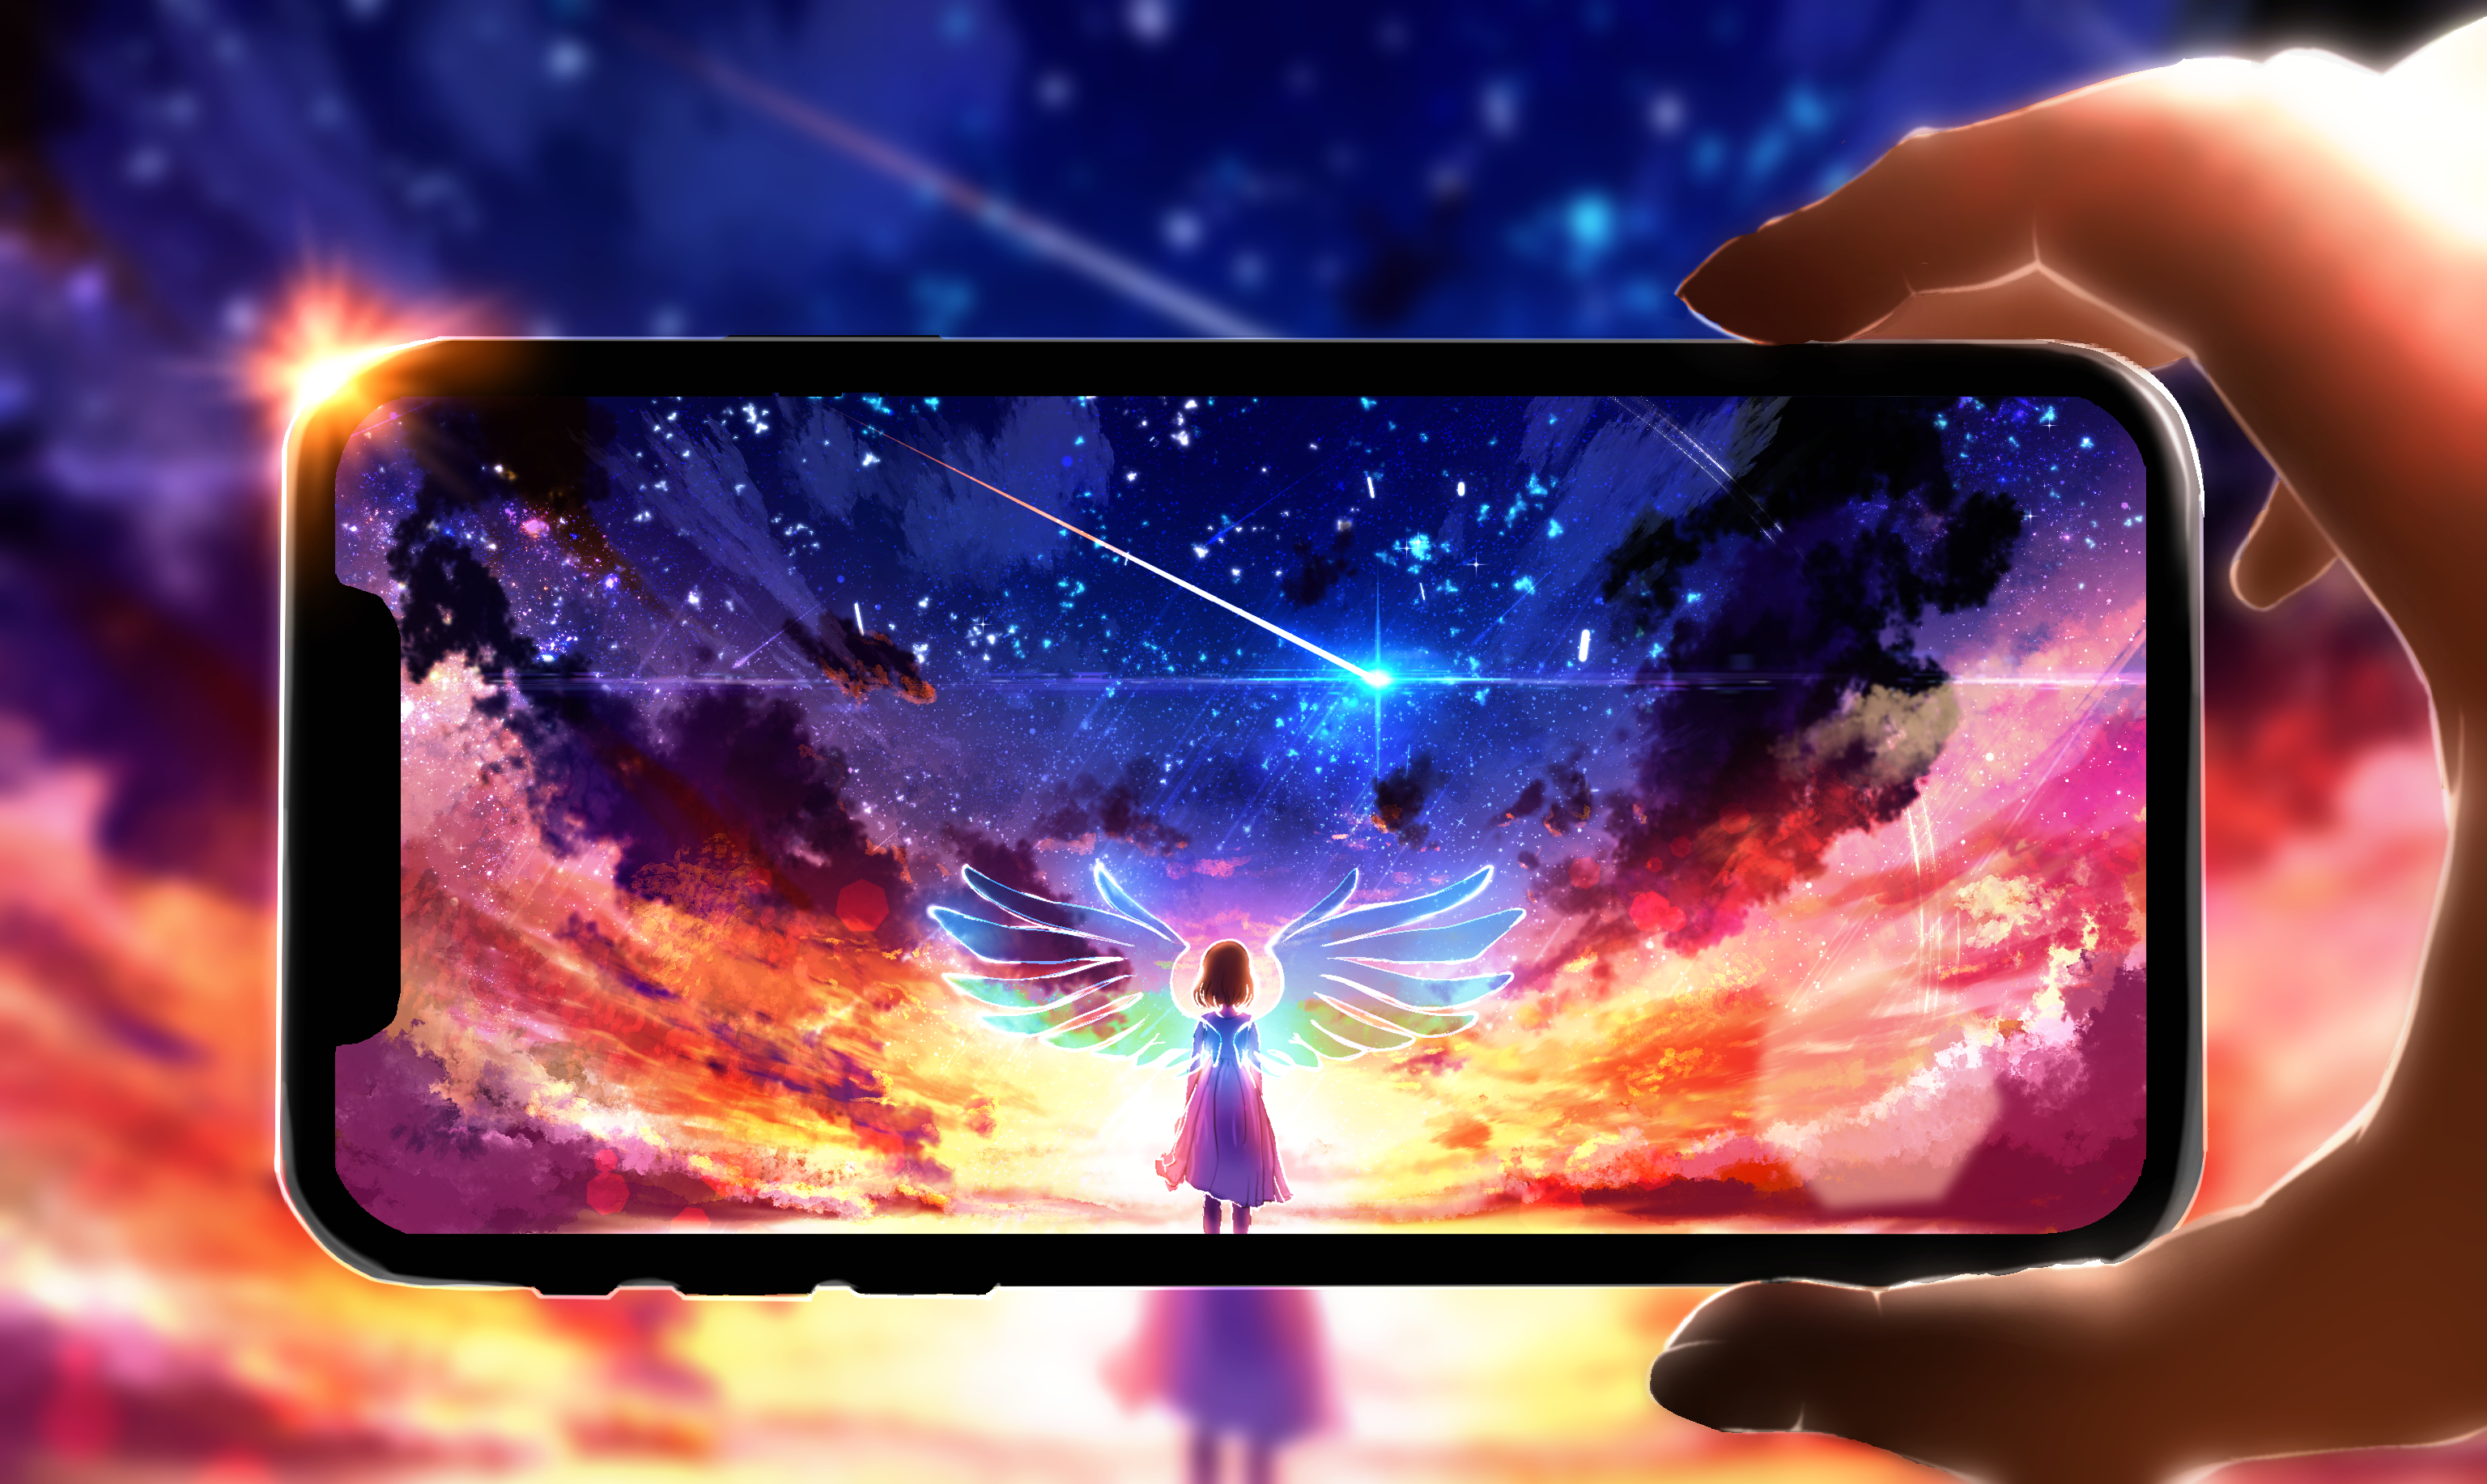 Girl Smartphone Wings Iphone 3072x1833